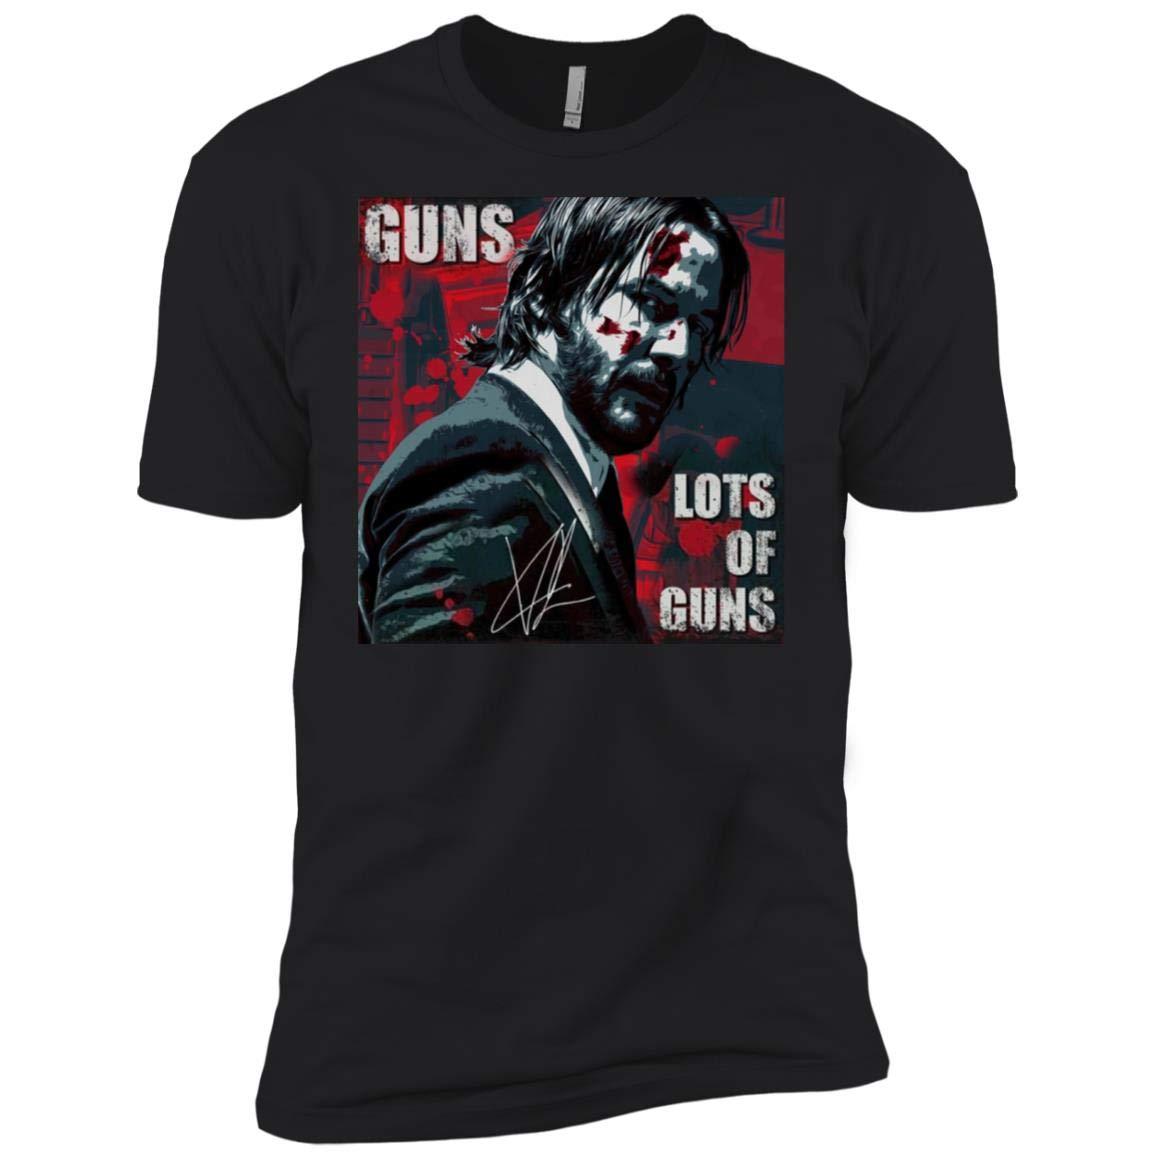 Signature Of John Wick Guns Lots Of Guns Shirt Gift Idea For Fans